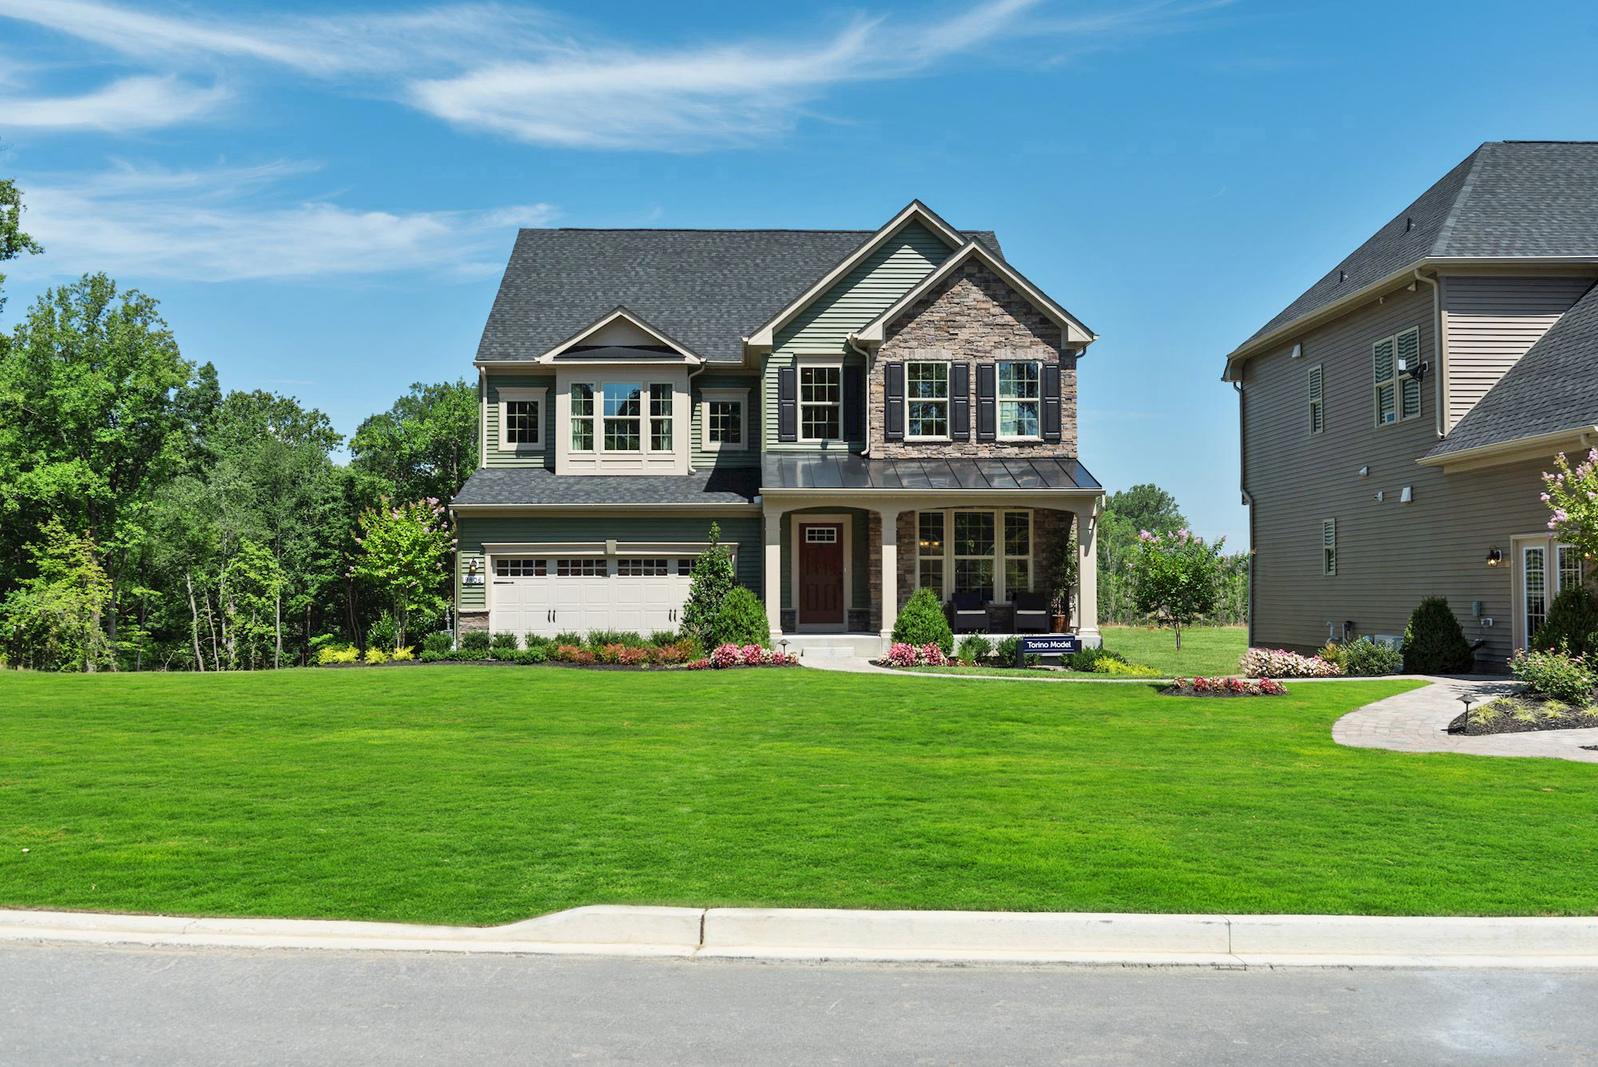 Heartland Luxury Homes New Home Model For Sale Heartland